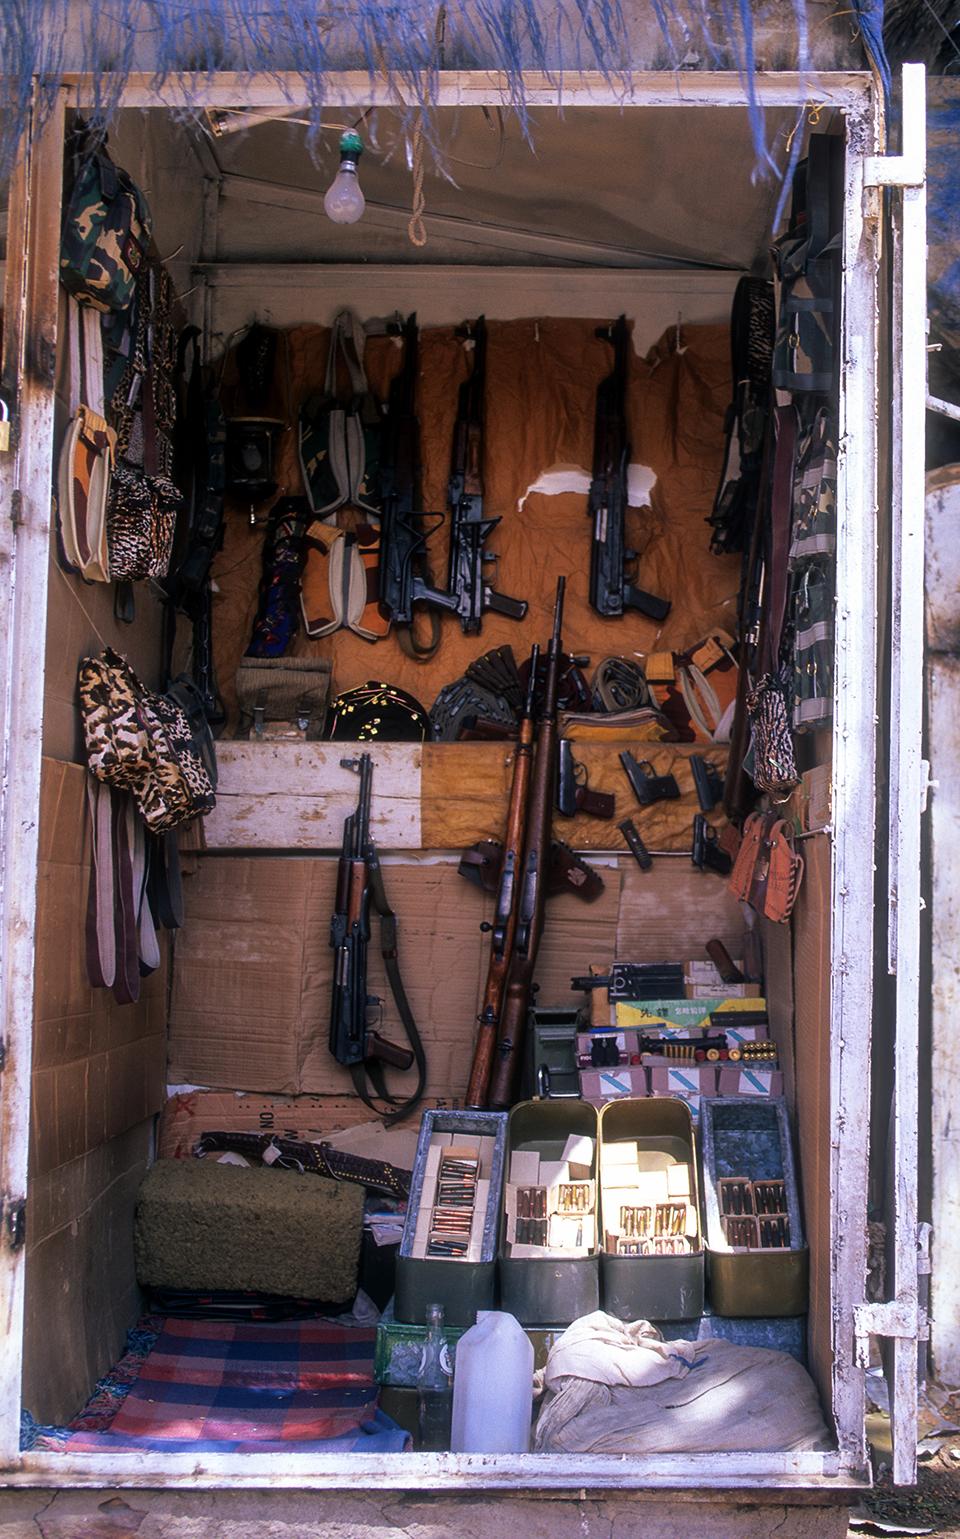 Guns for sale in shipping container at Gun market in Sada, Northern Yemen. _LP.jpg